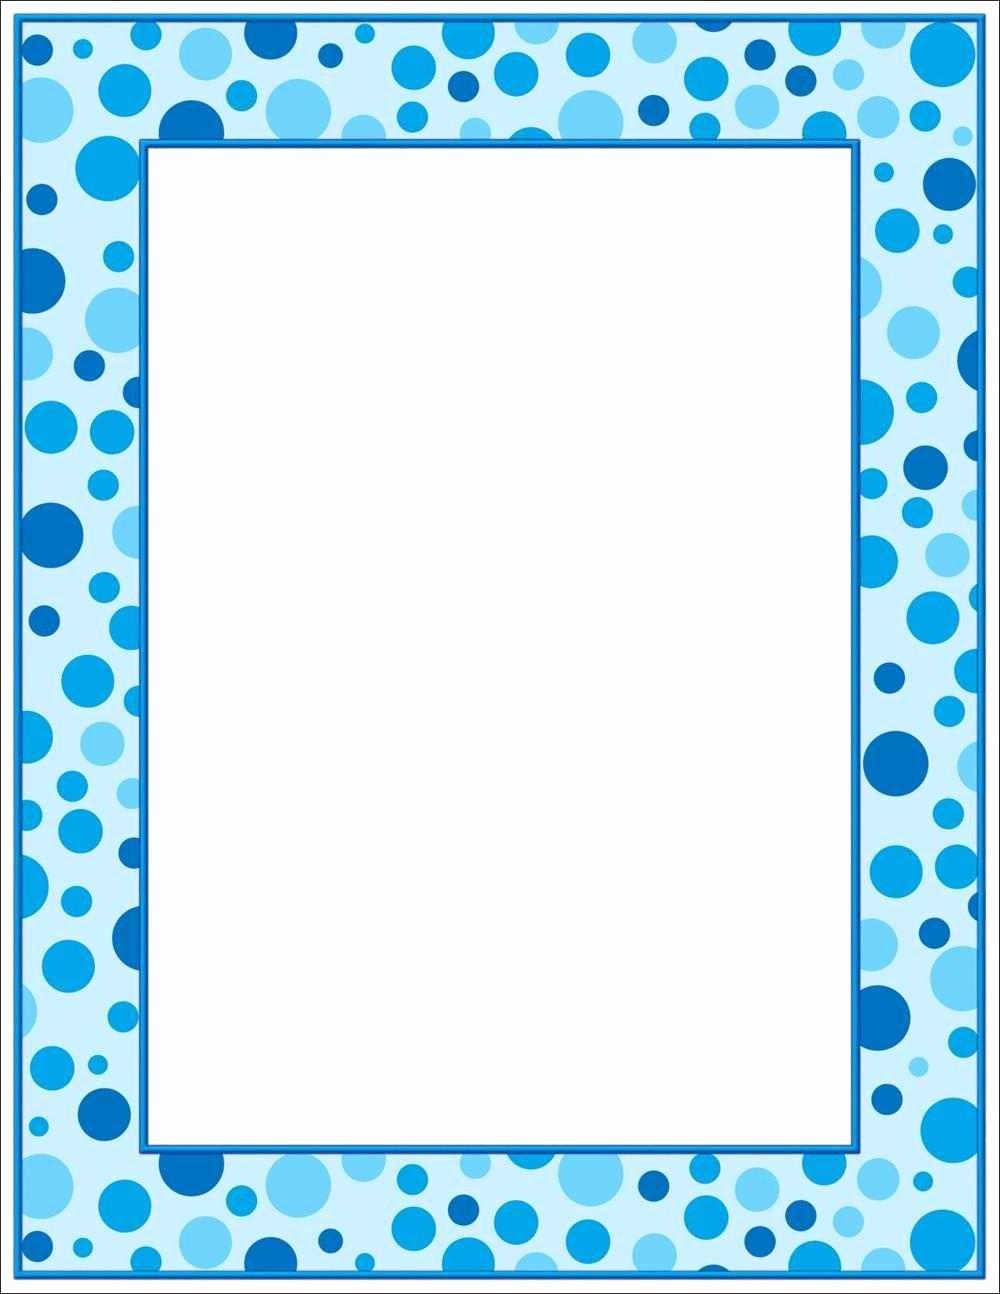 Polka Dot Template for Word New 4 Best Of Printable Polka Dot Borders Blue Polka